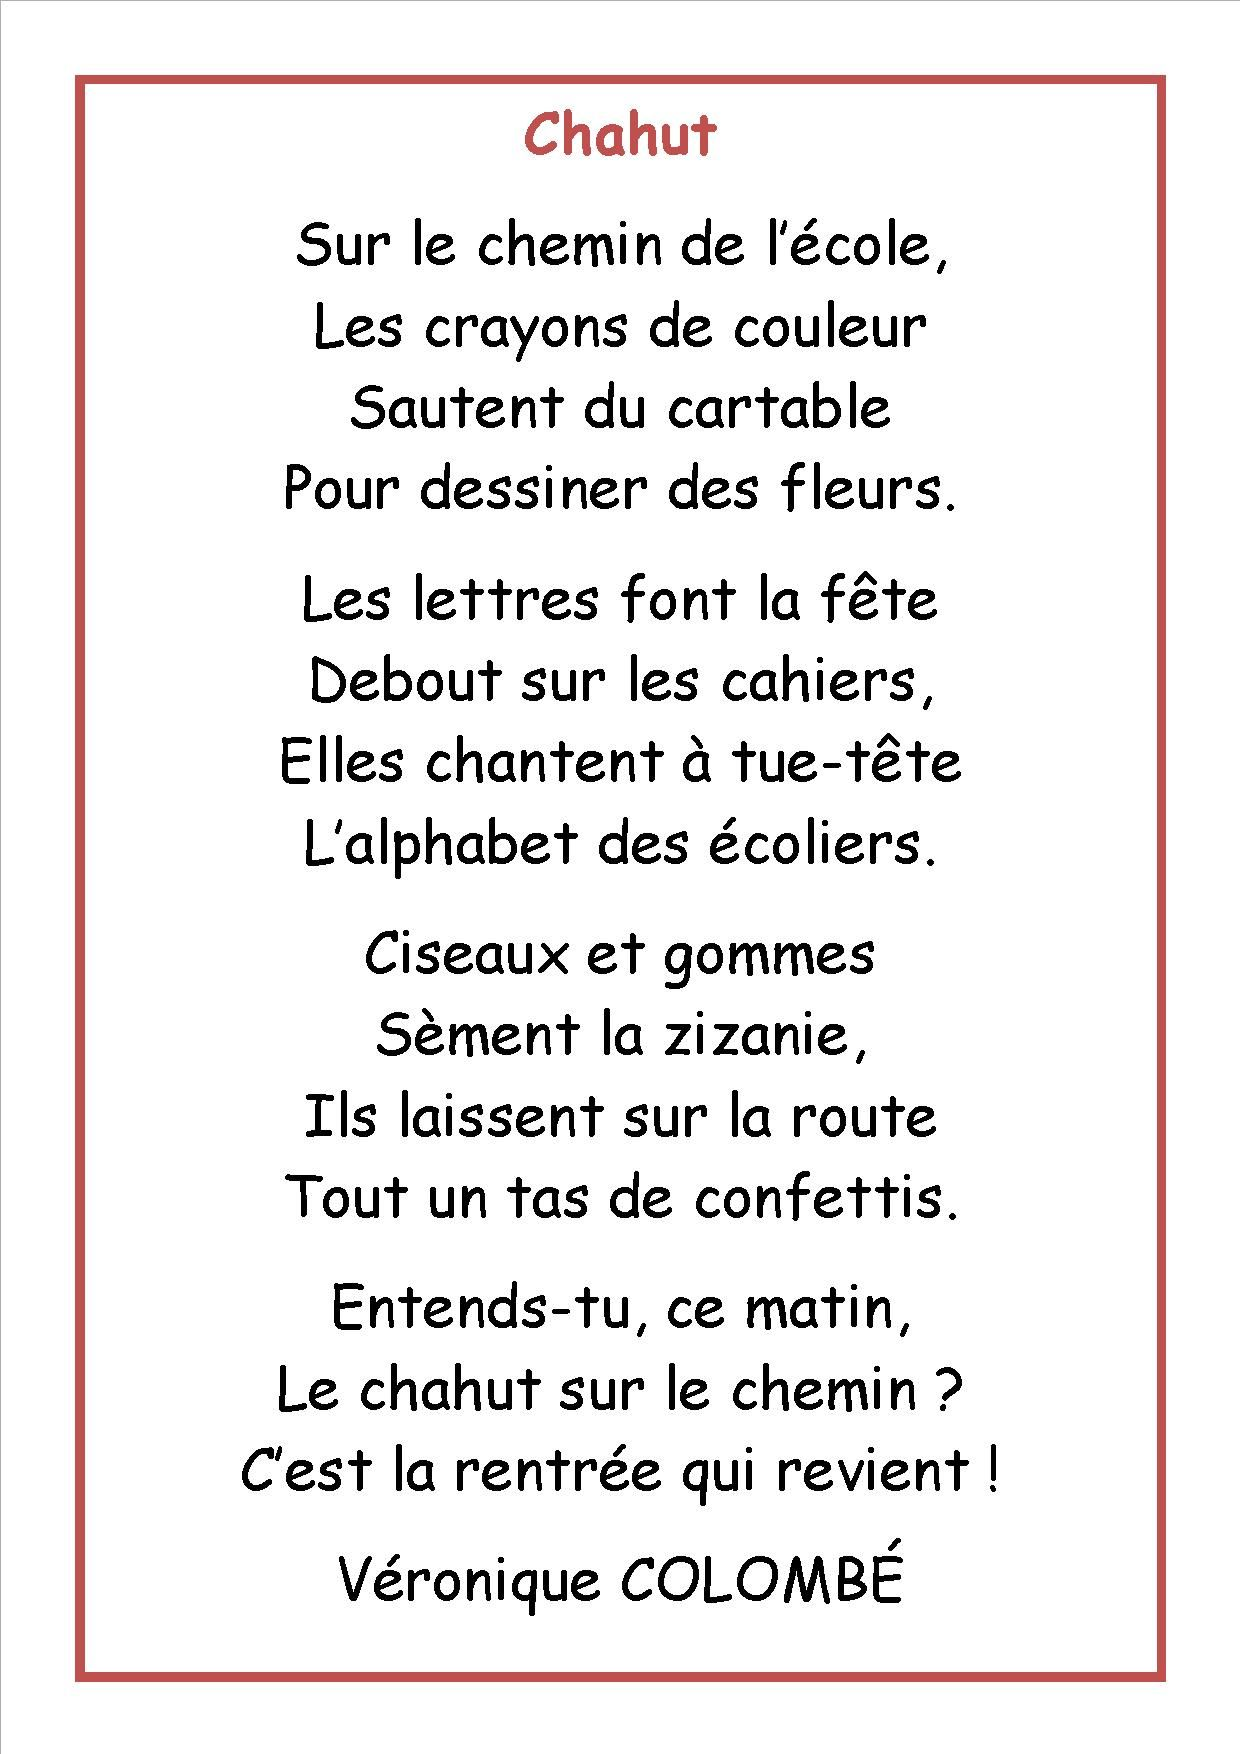 Un peu de poésie Août 2019   Ff00e0c298f04d4858a2ce8a0f560f04